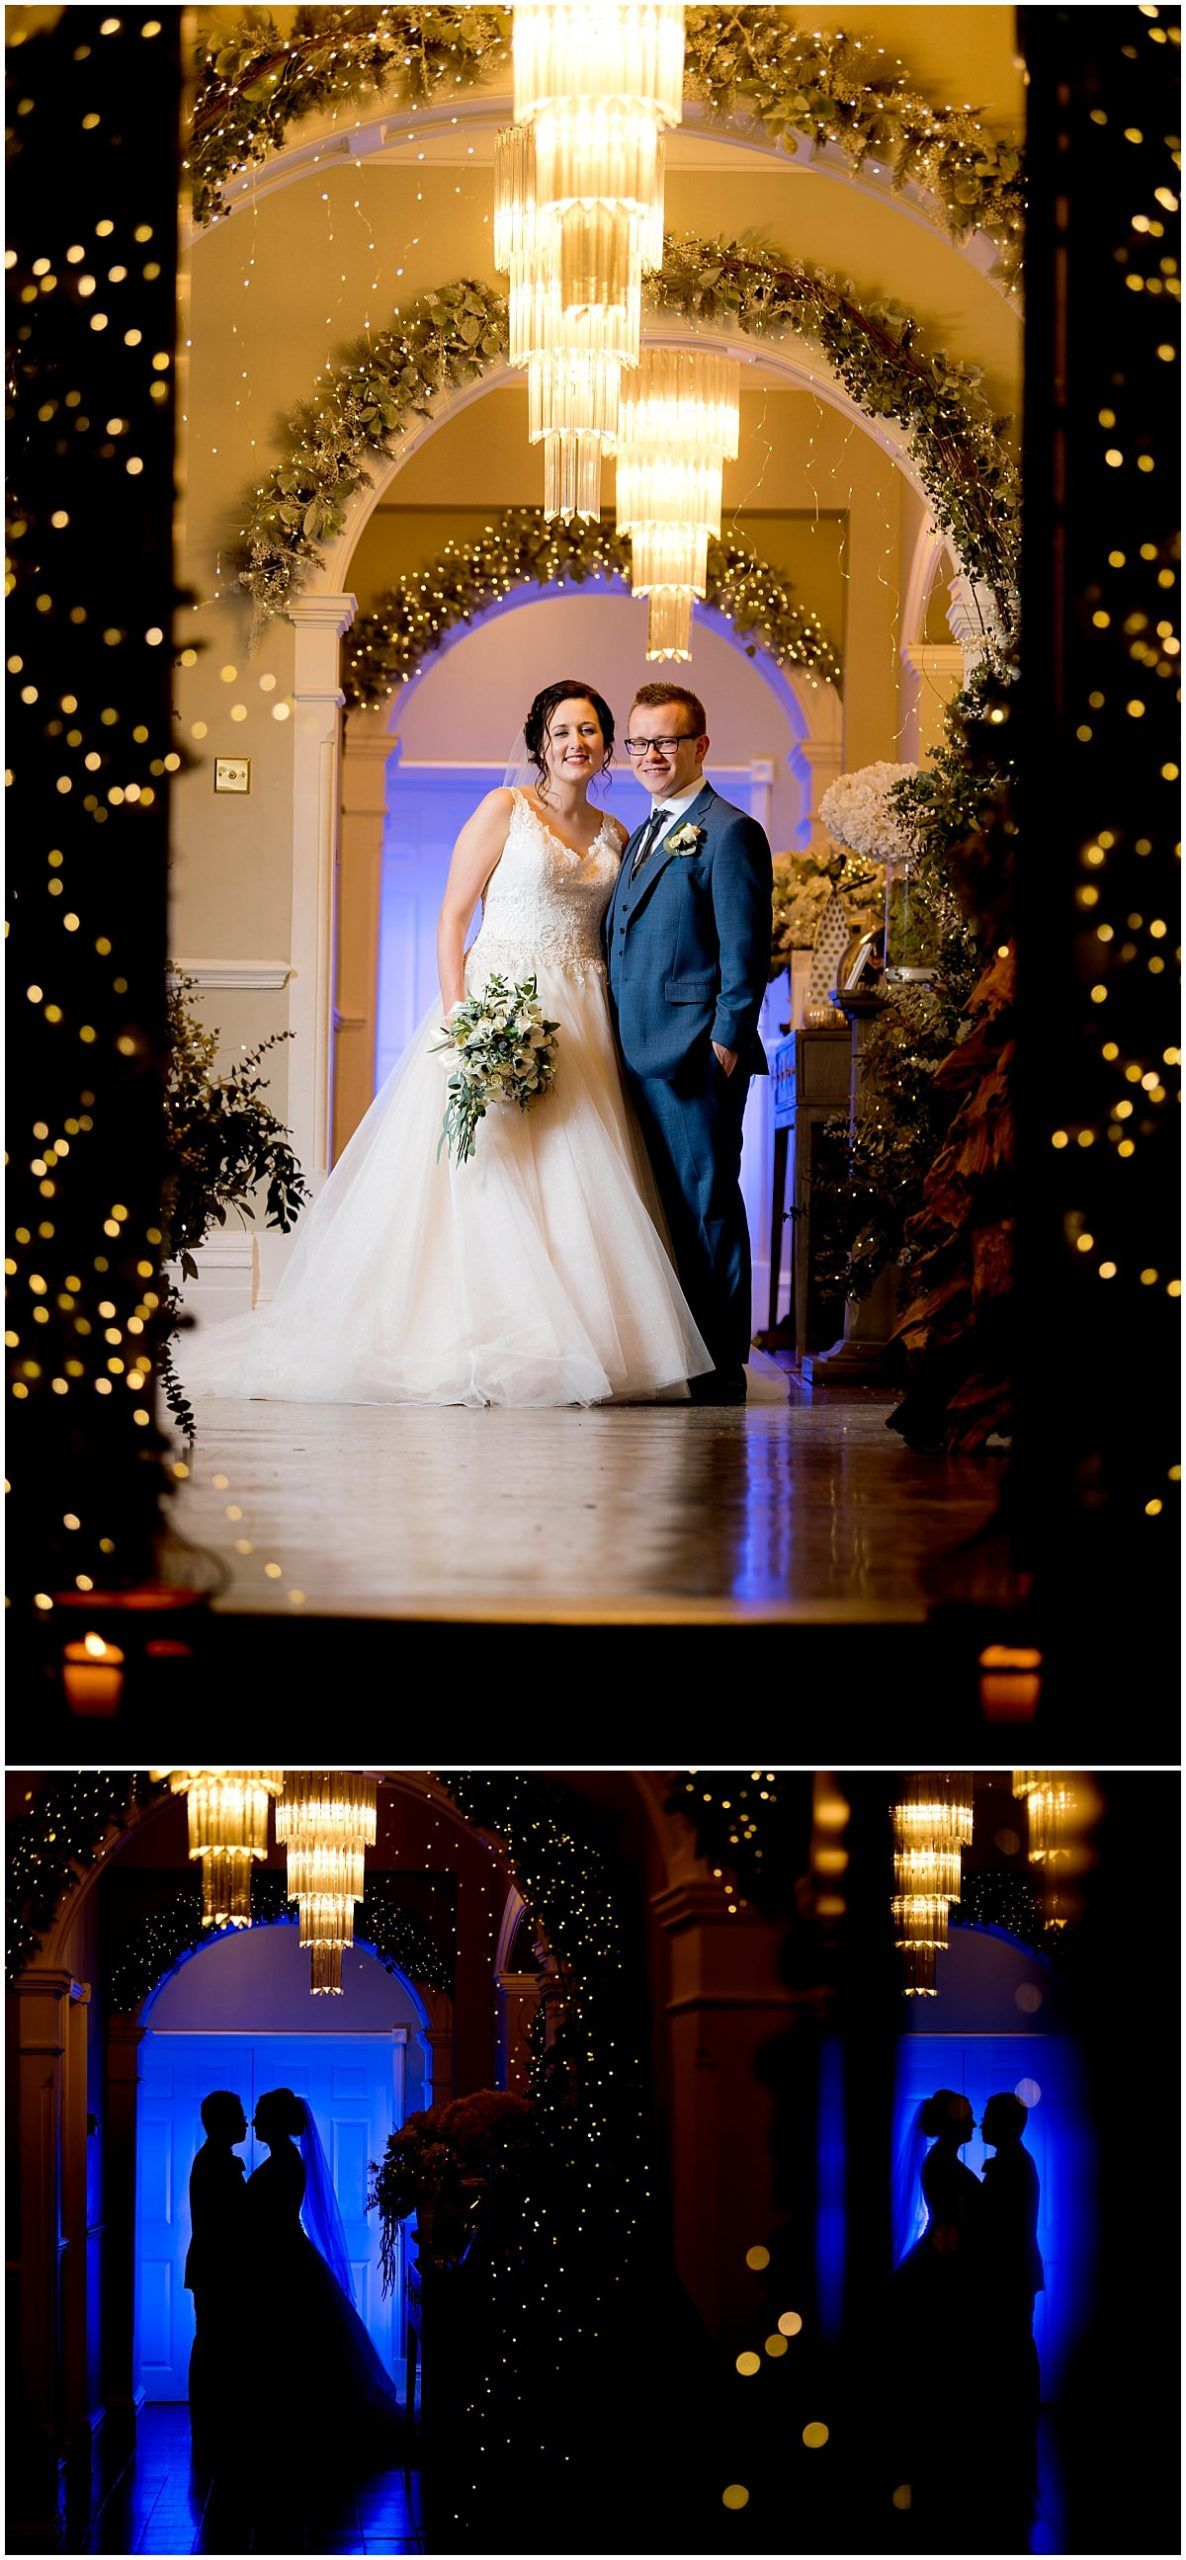 Wedding at Blackbrook House bride and groom